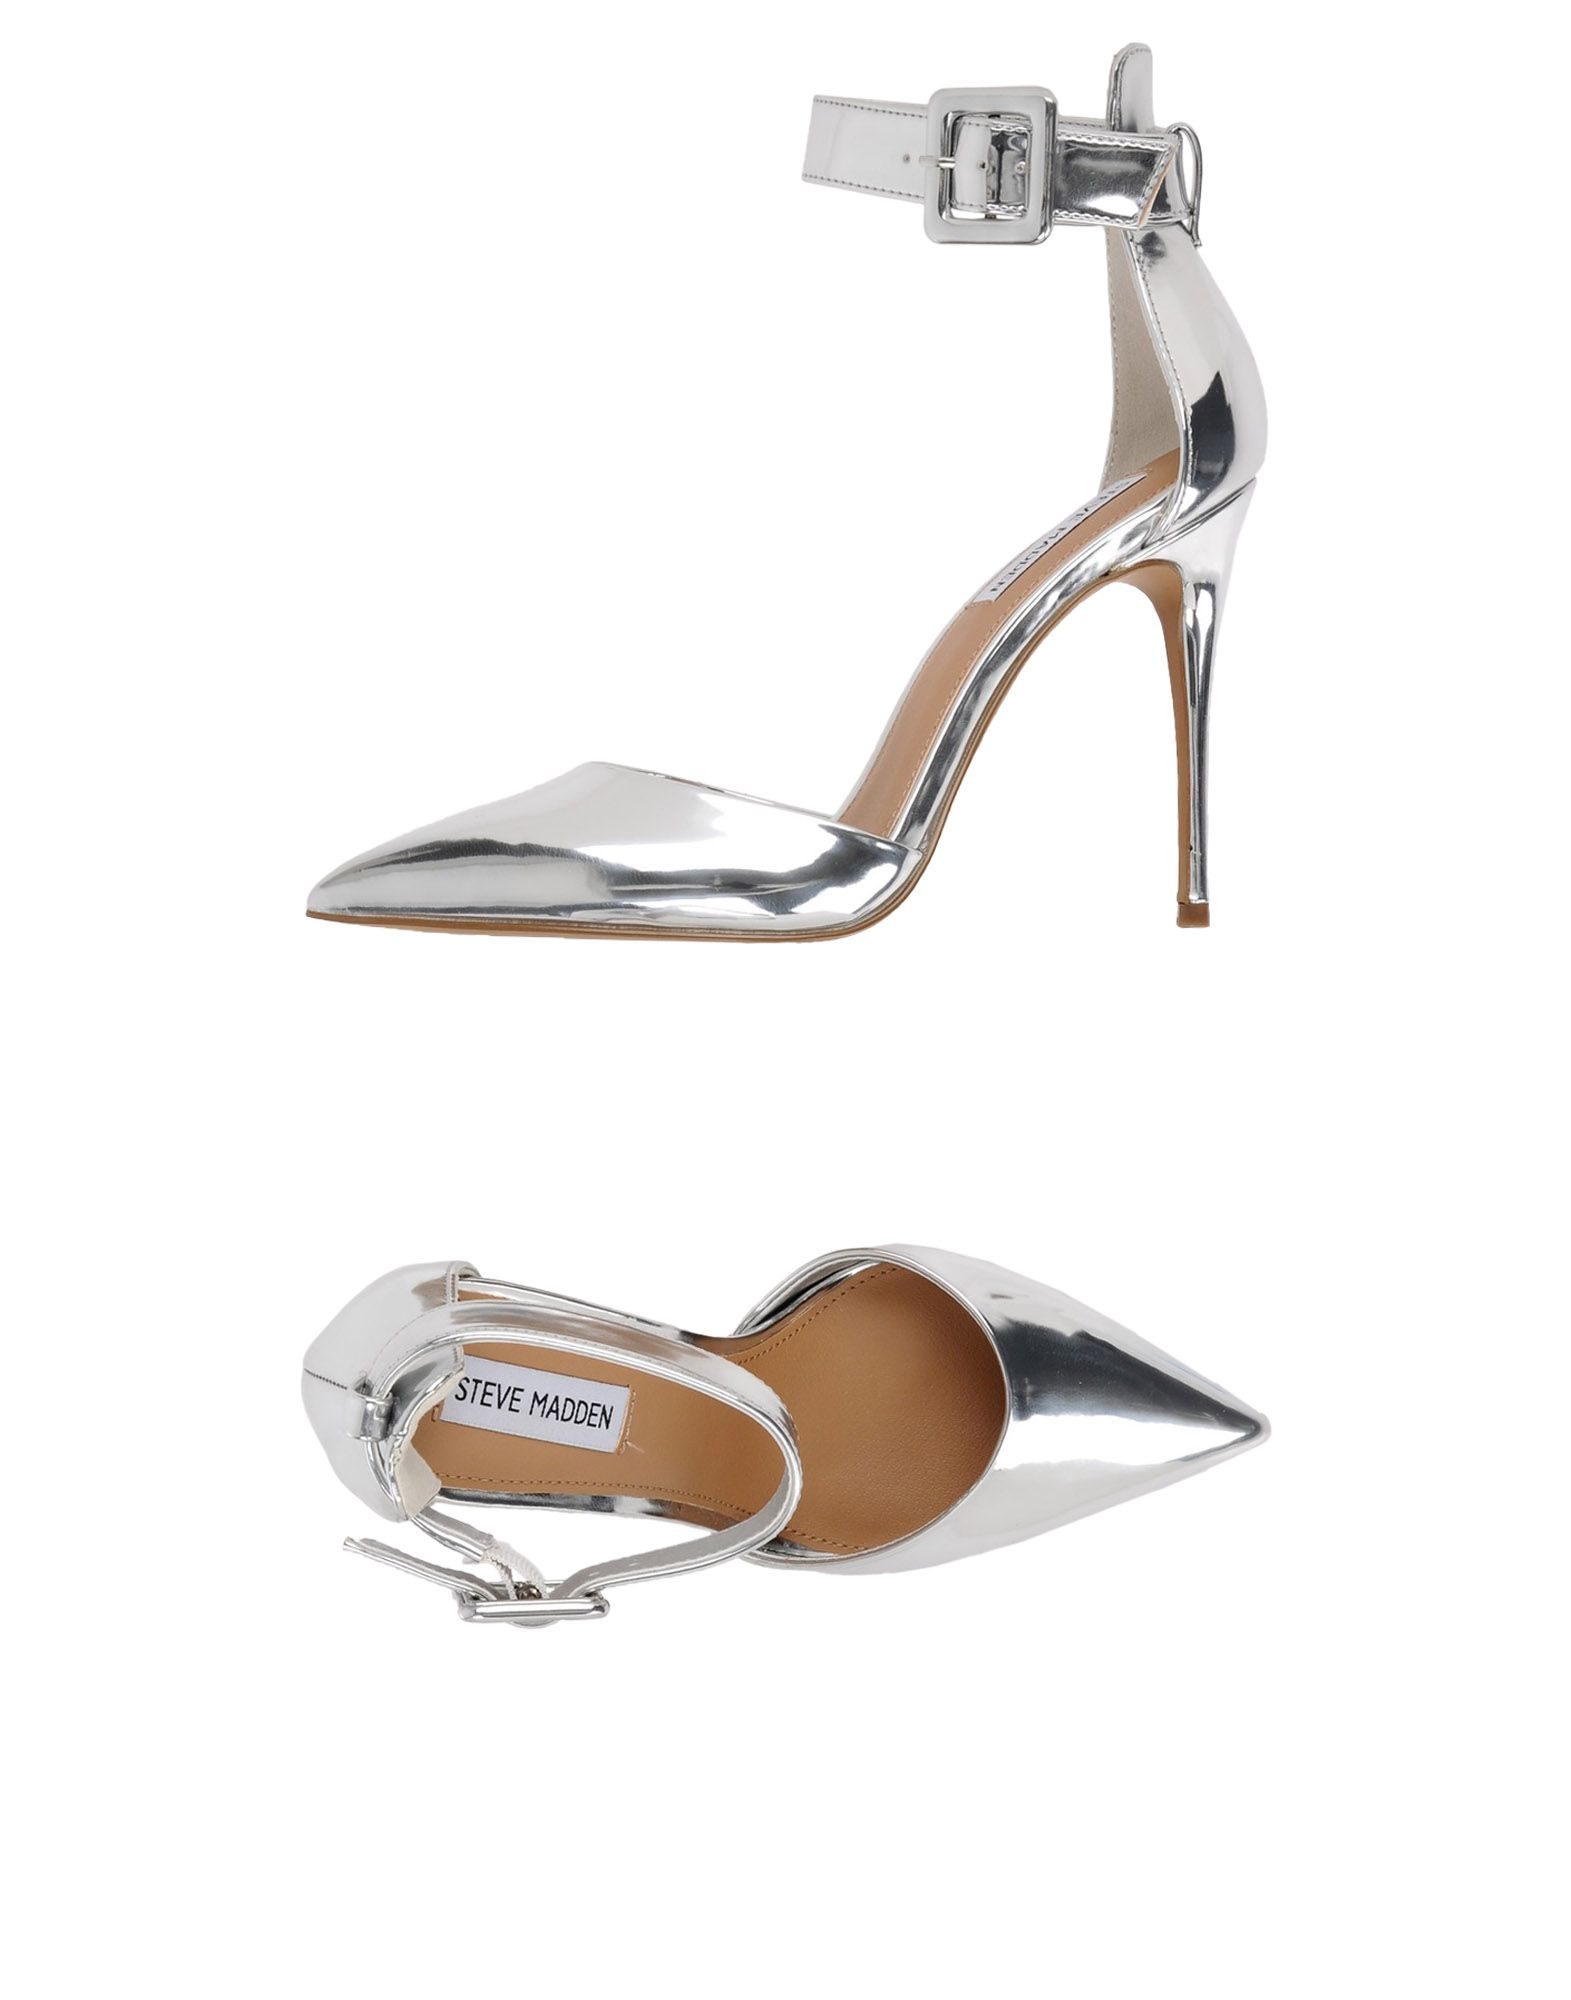 Décolleté Steve Madden Desire High Heel Sandal - Donna - Acquista online su